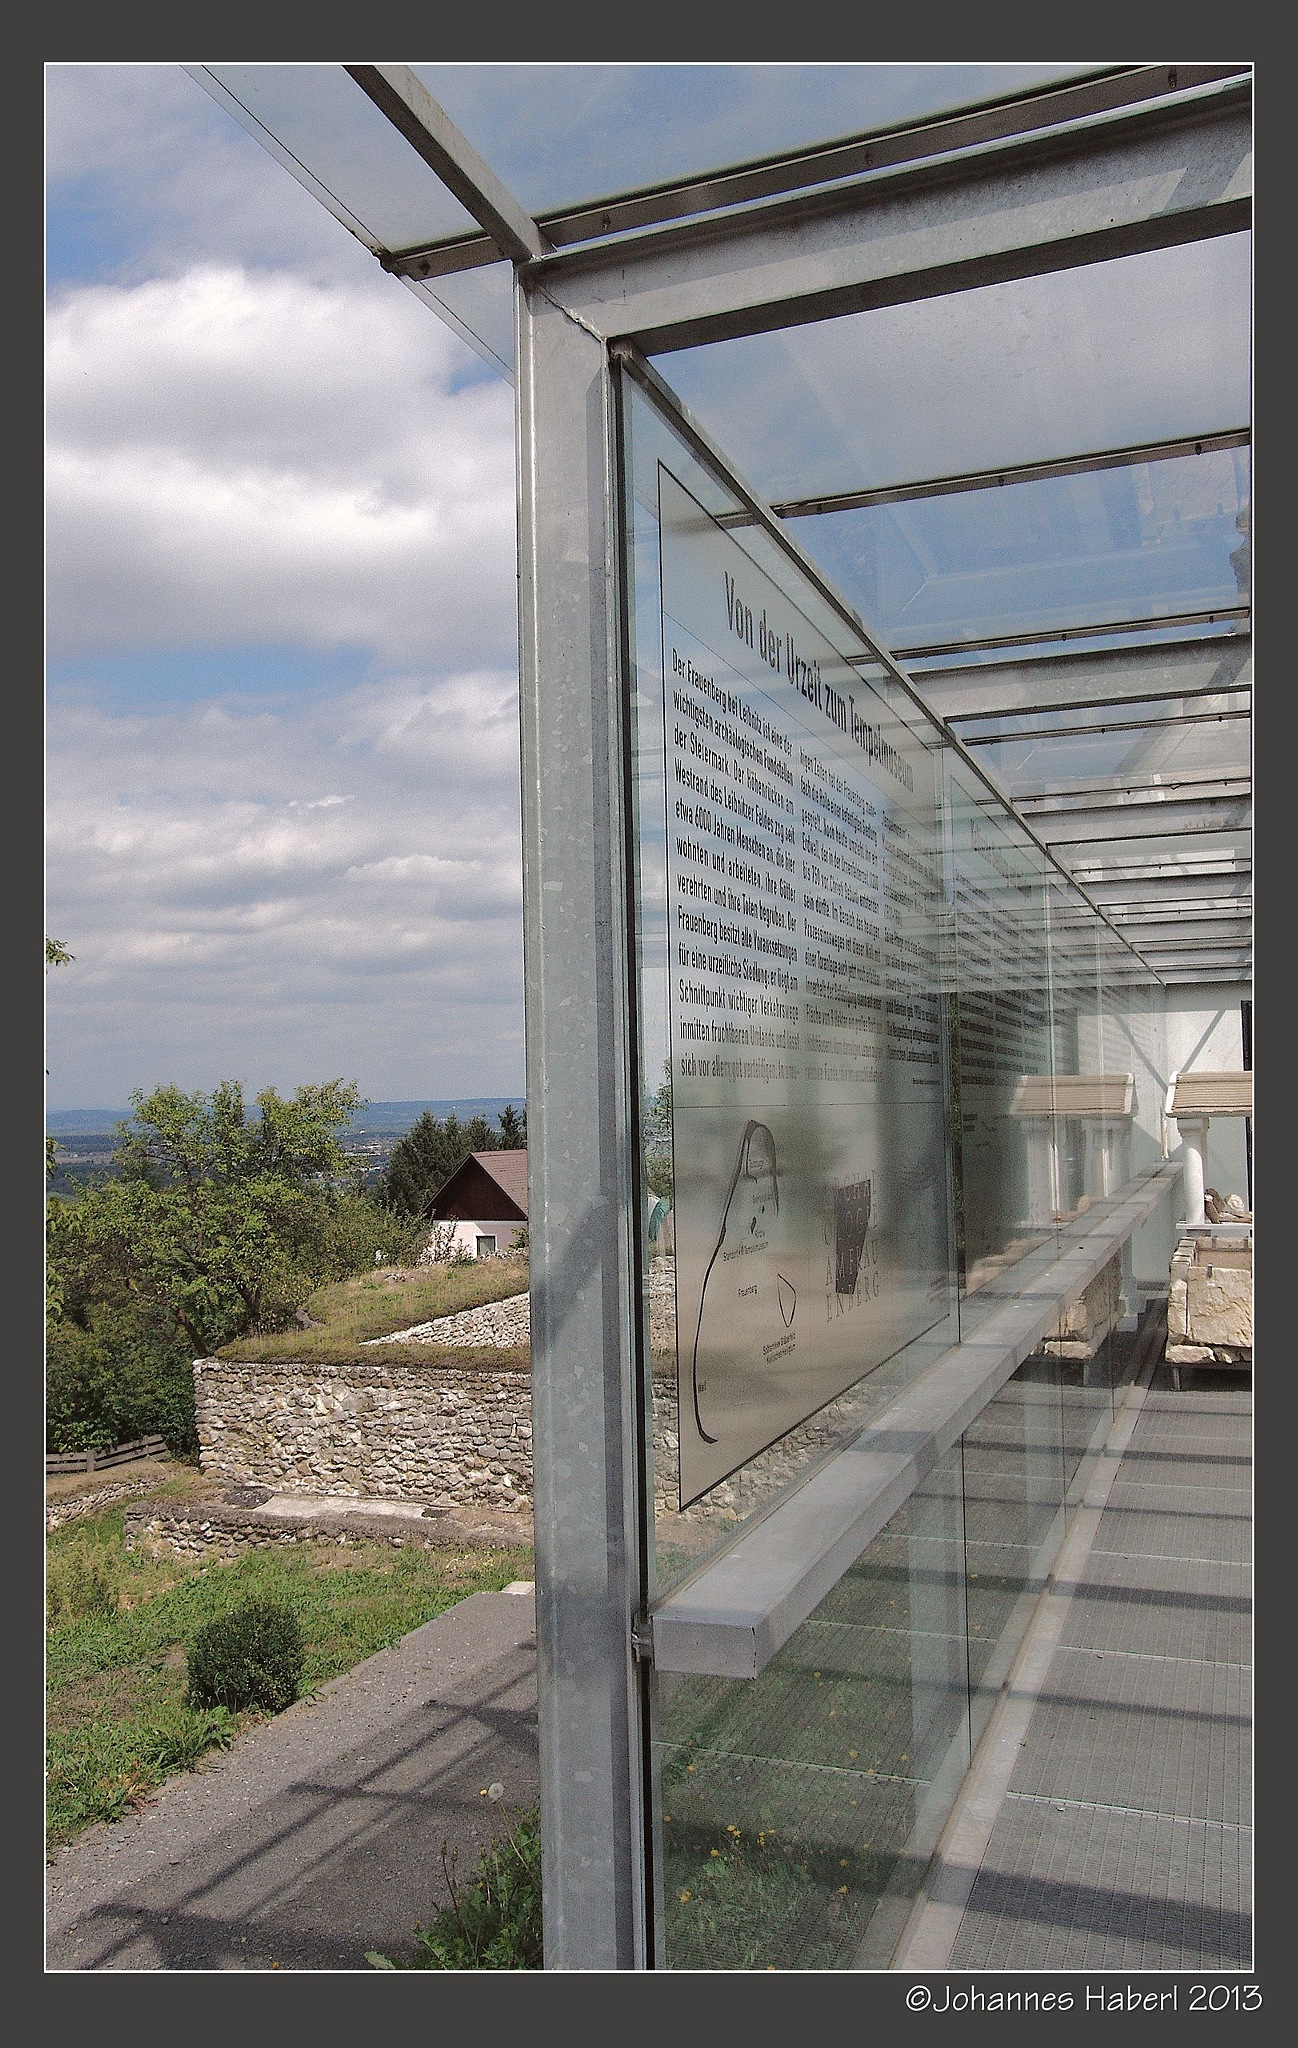 Frauenberg - museum II by Johannes Haberl